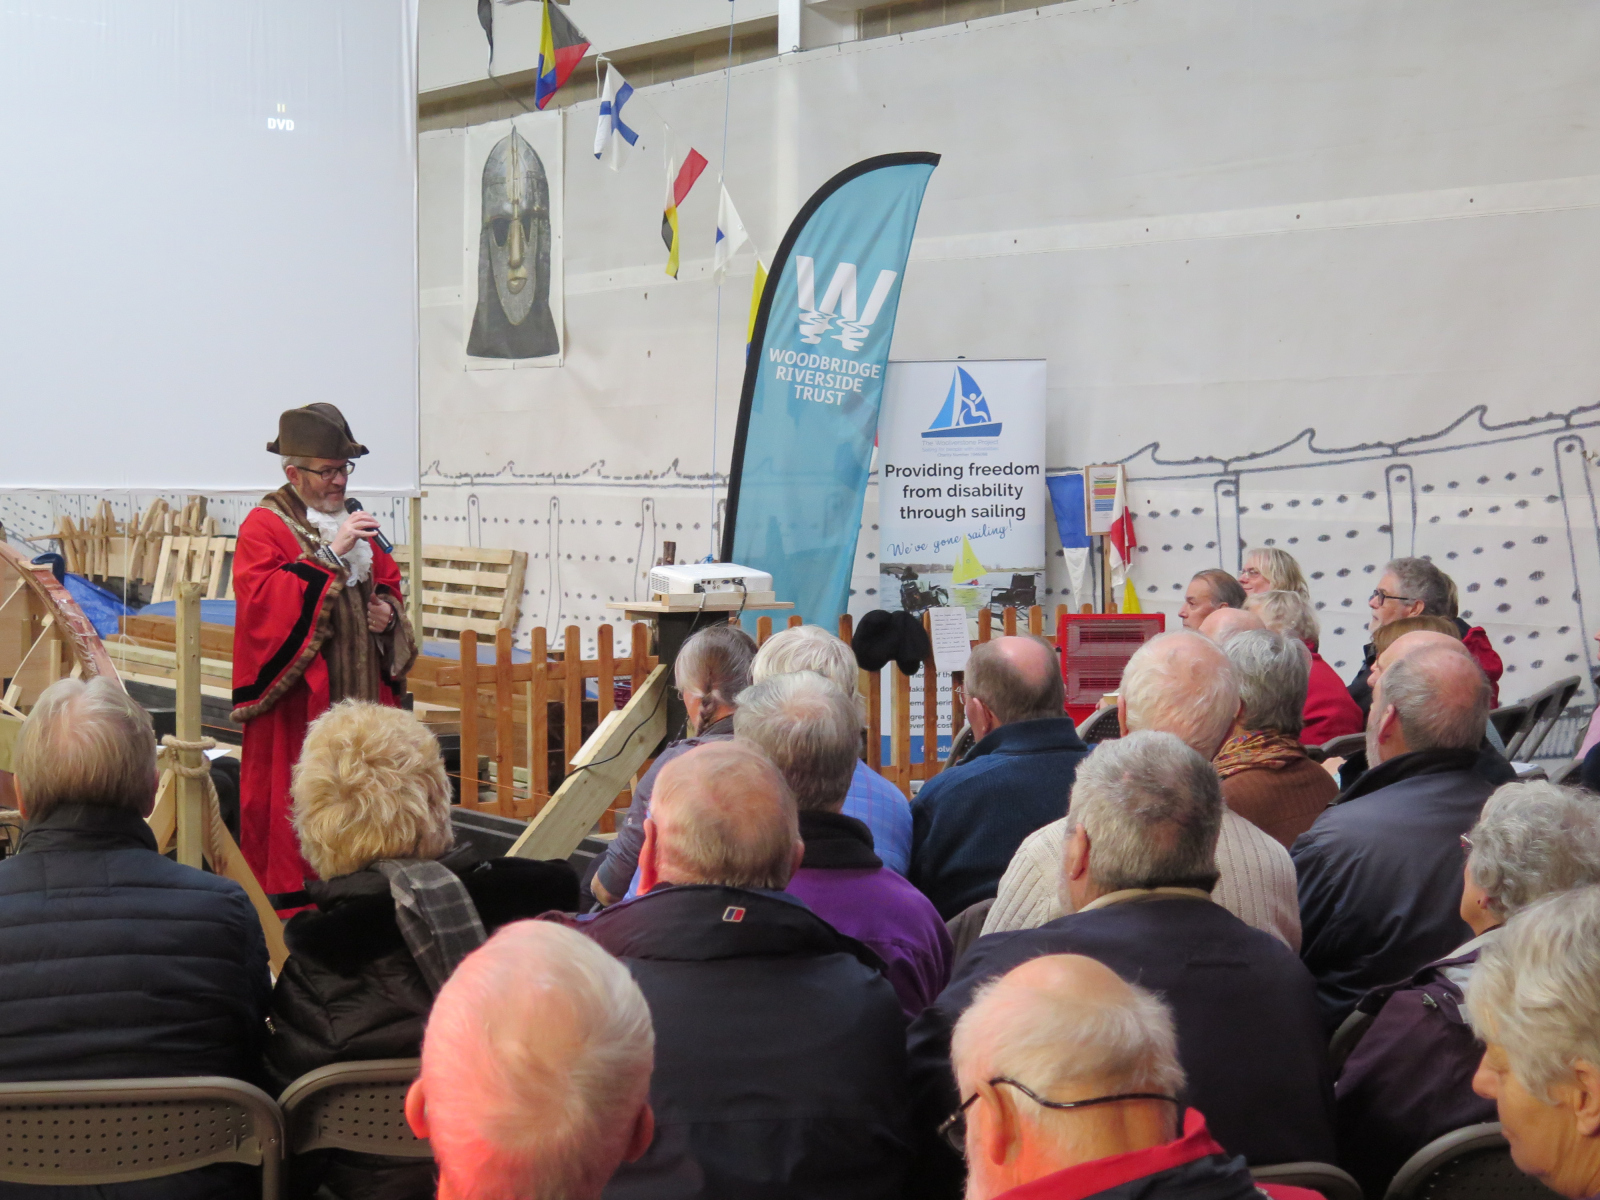 Opening ceremony - Mayor of Woodbridge